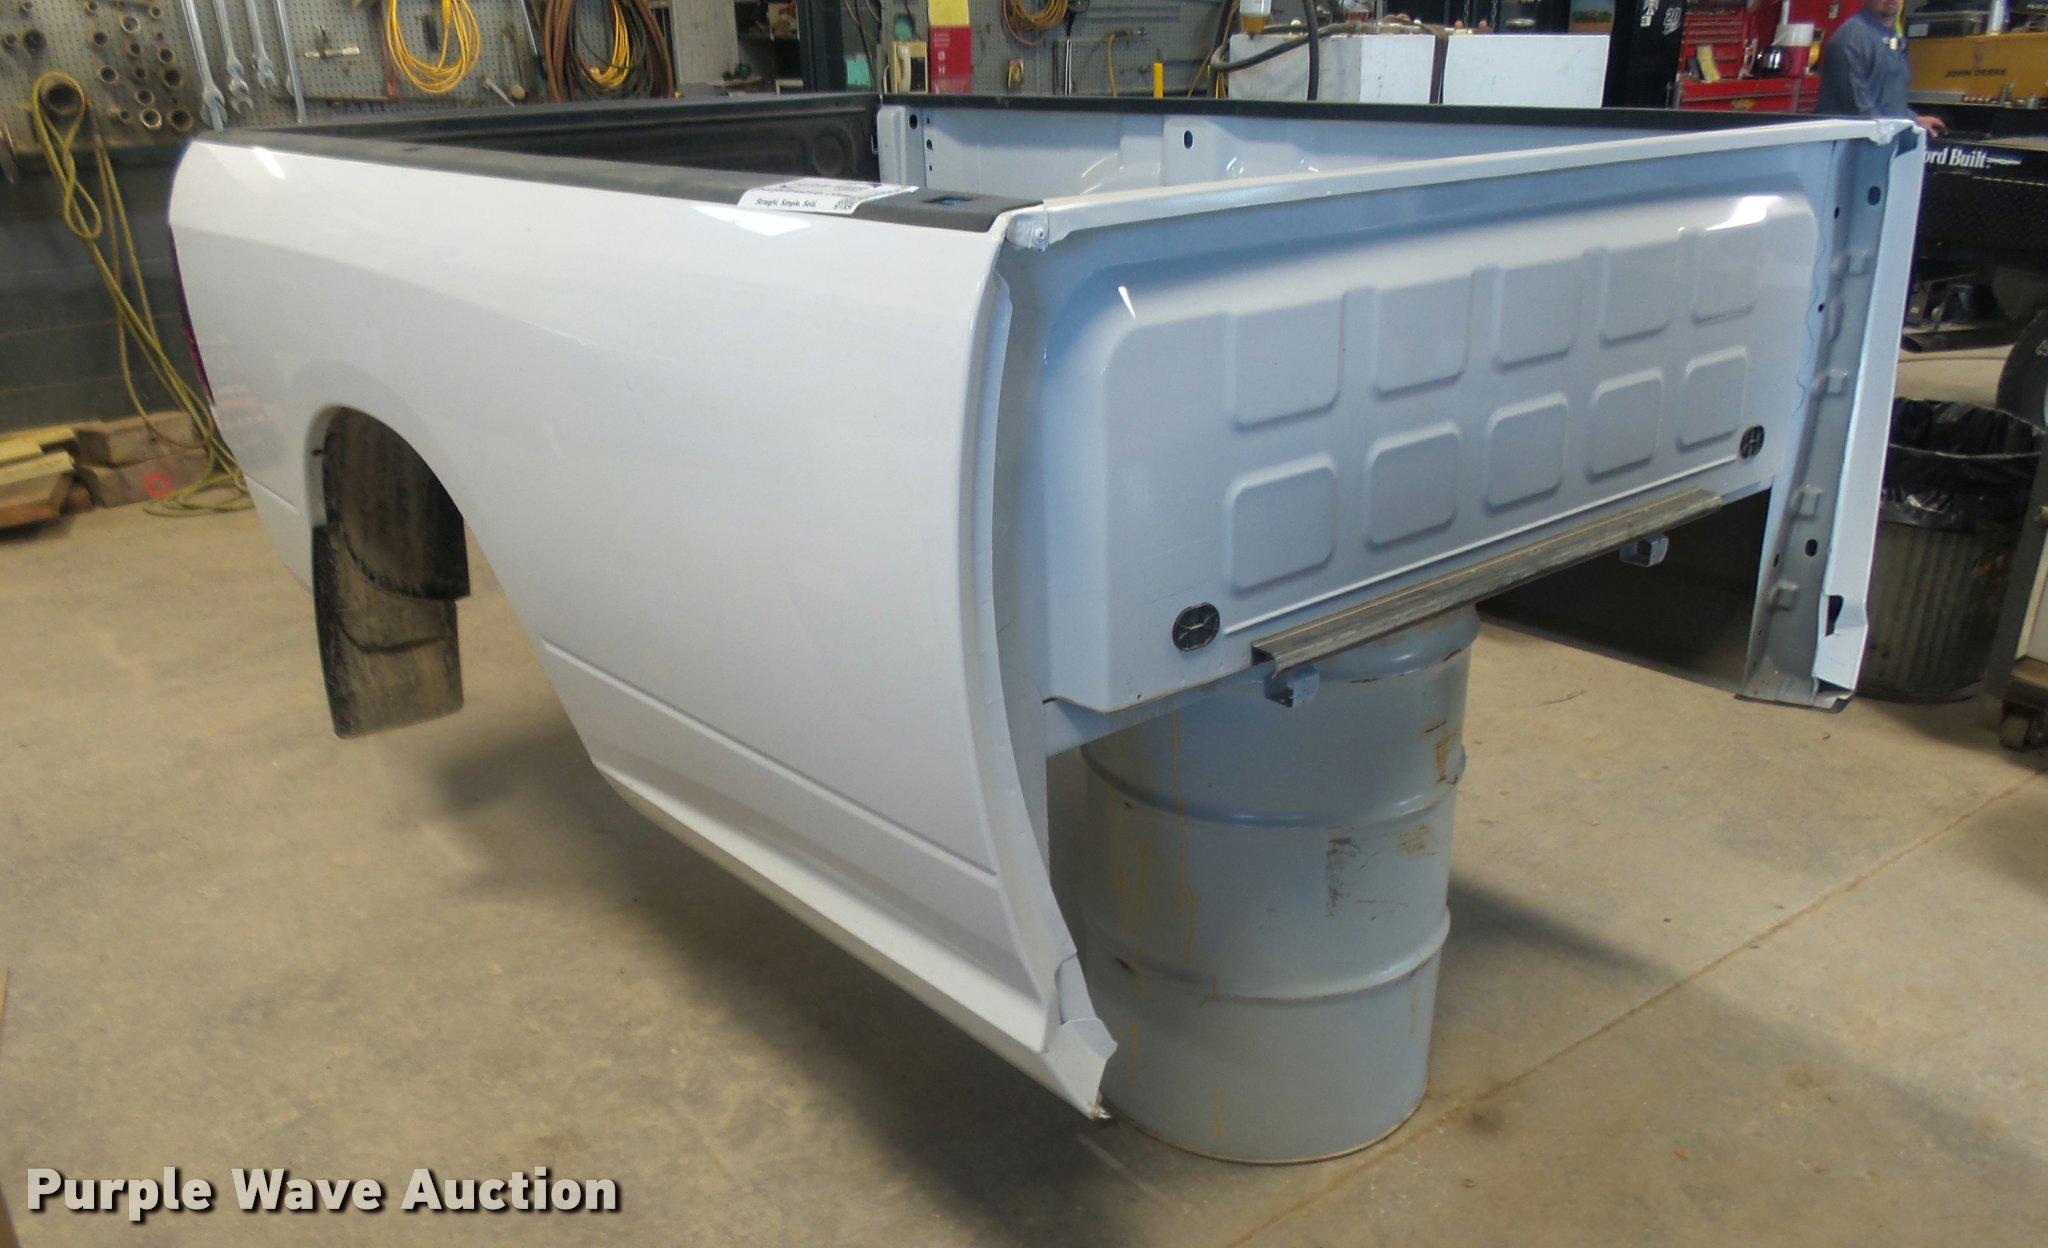 Dodge Ram Truck Bed For Sale >> 2017 Dodge Ram 3500 Pickup Truck Bed Item Da5568 7 11 2017